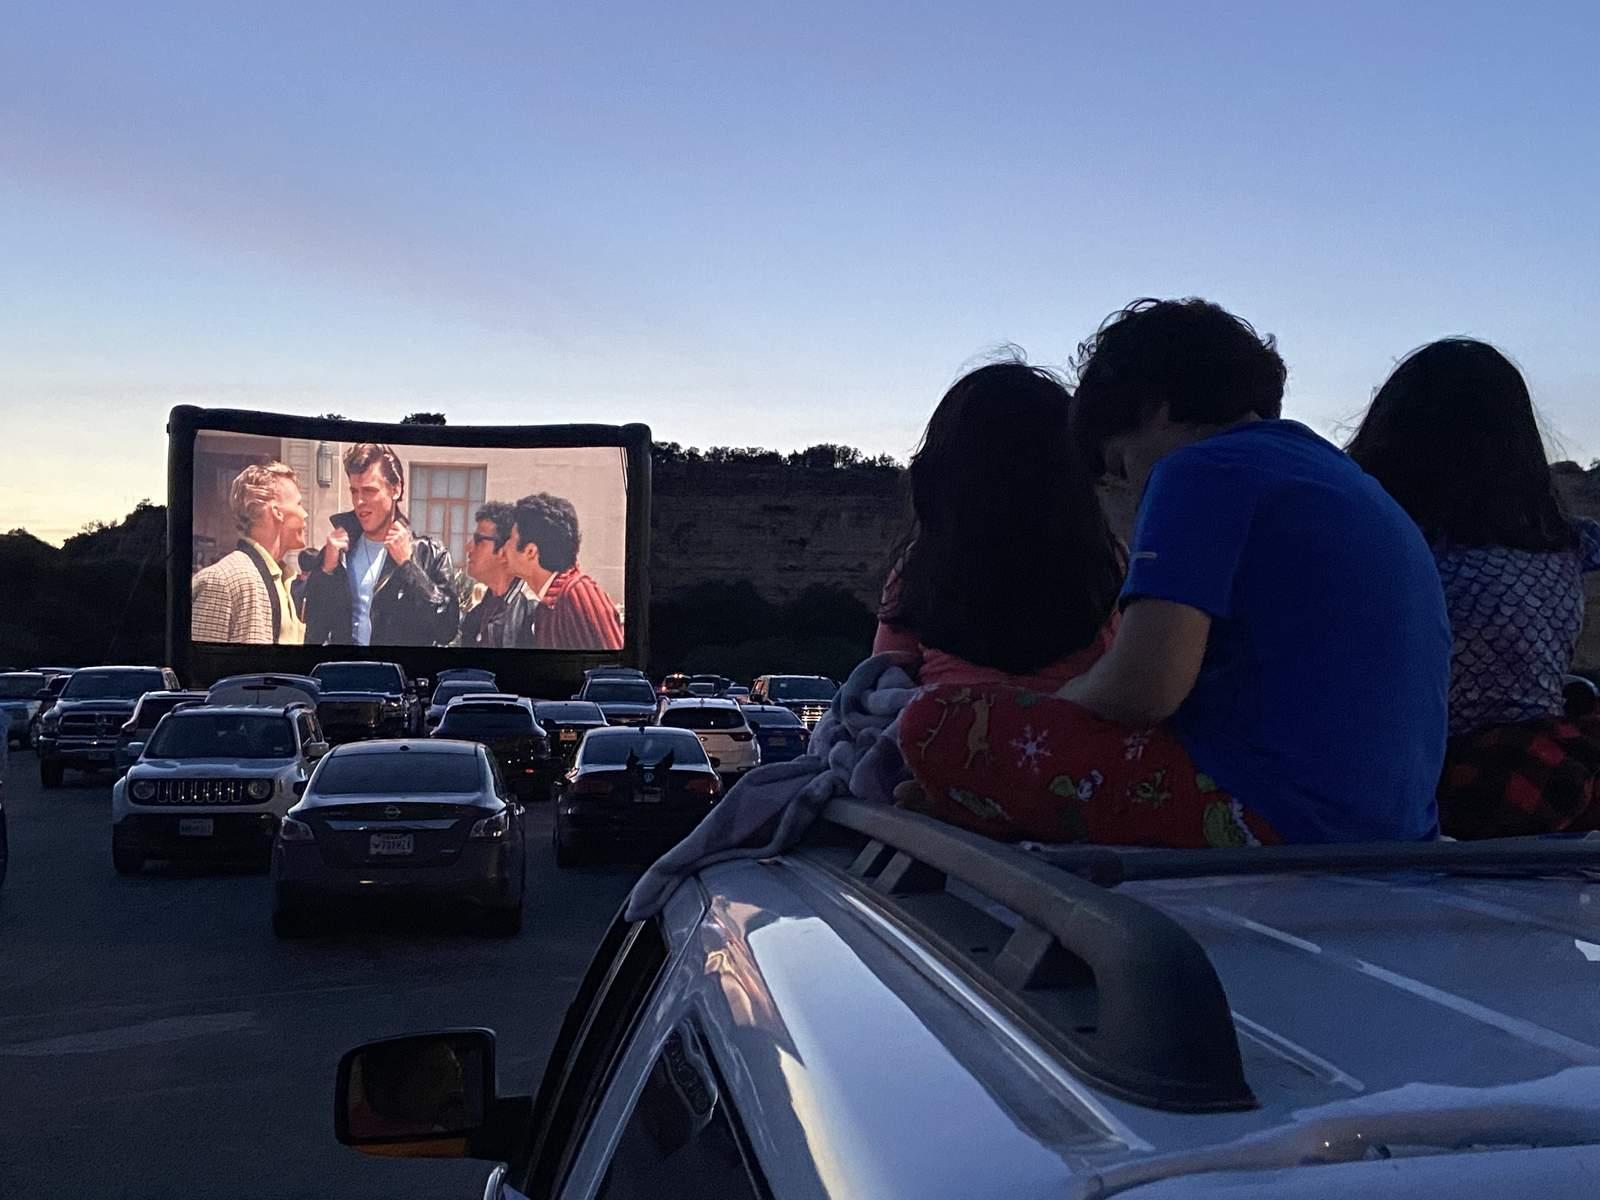 Halloween Horror Nights 2020 Fiesta Texas San Antonio Drive In at Fiesta Texas releases fall movies lineup